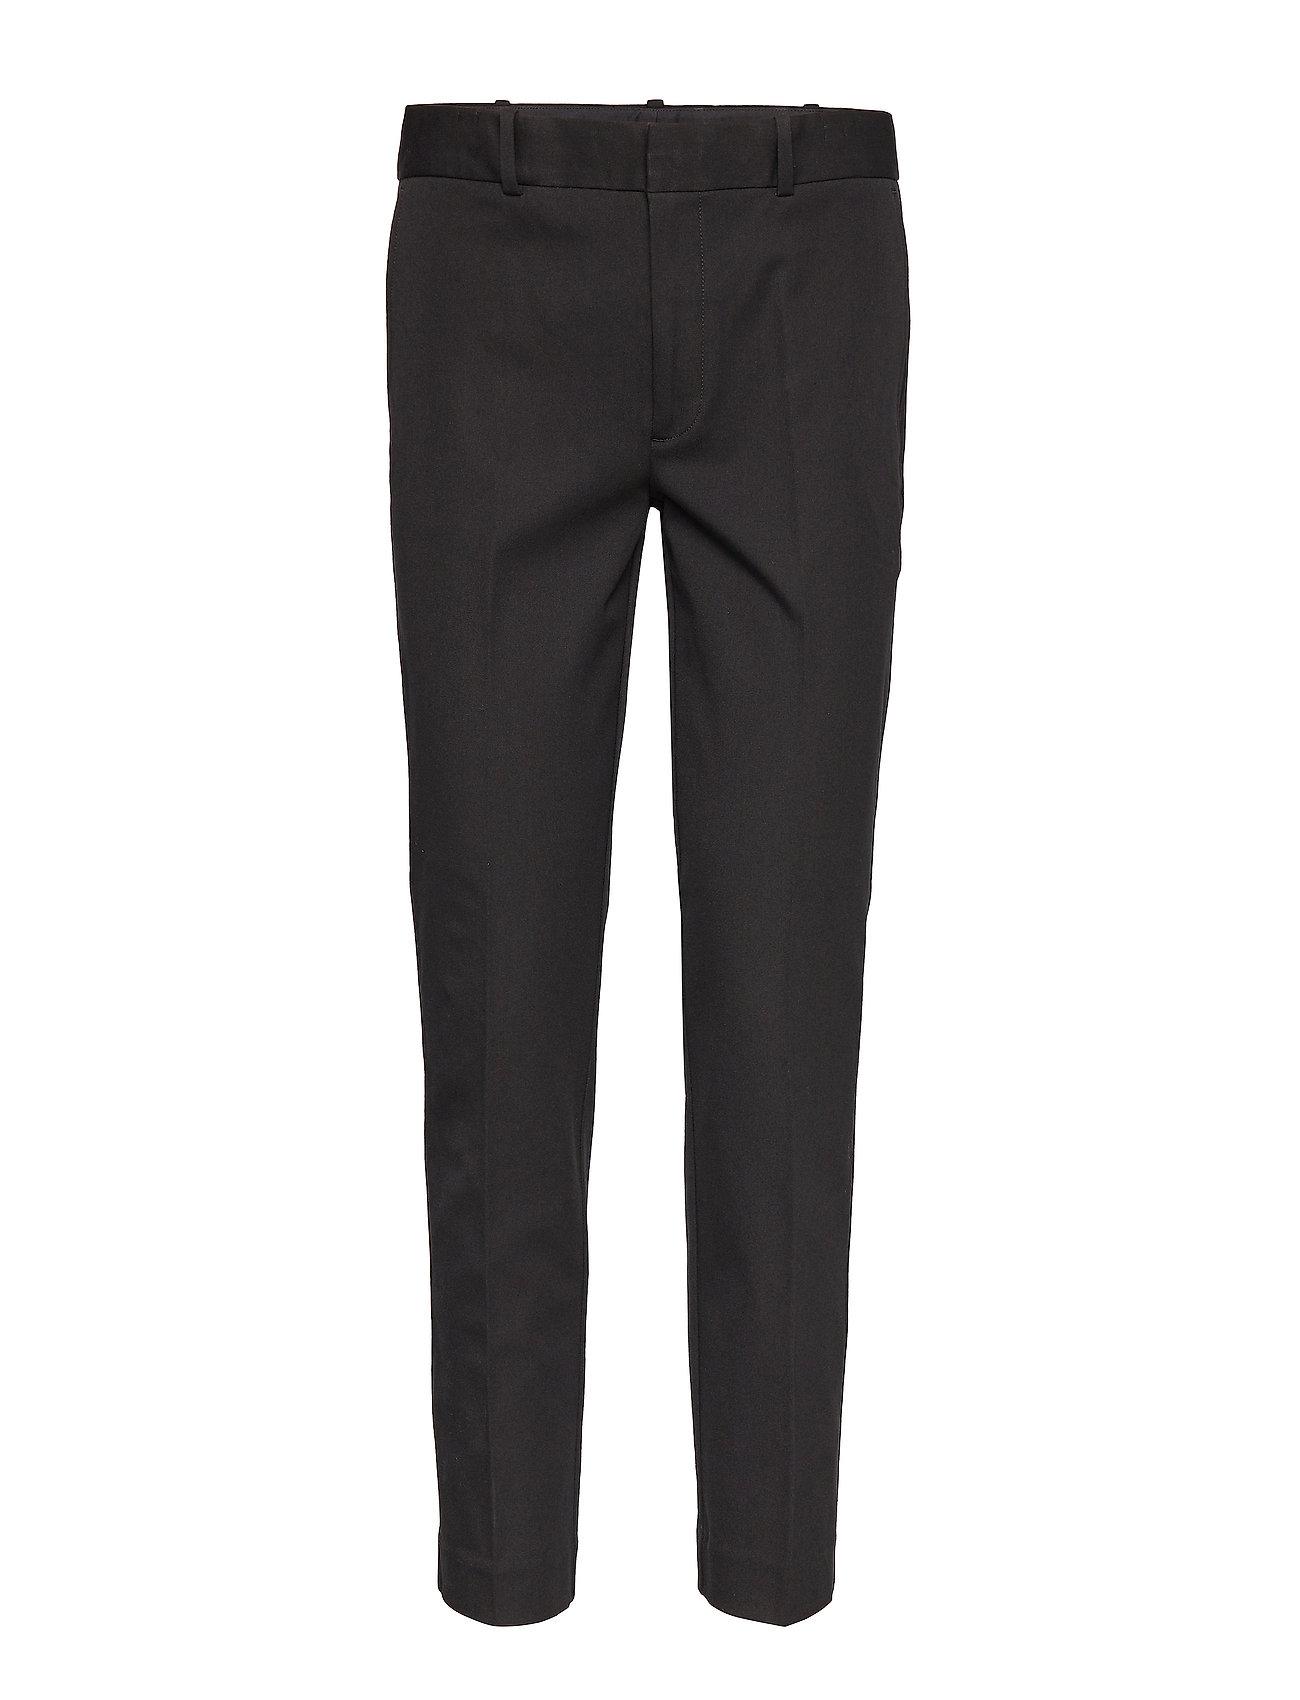 Polo Ralph Lauren Bi-Stretch Twill Pant - POLO BLACK